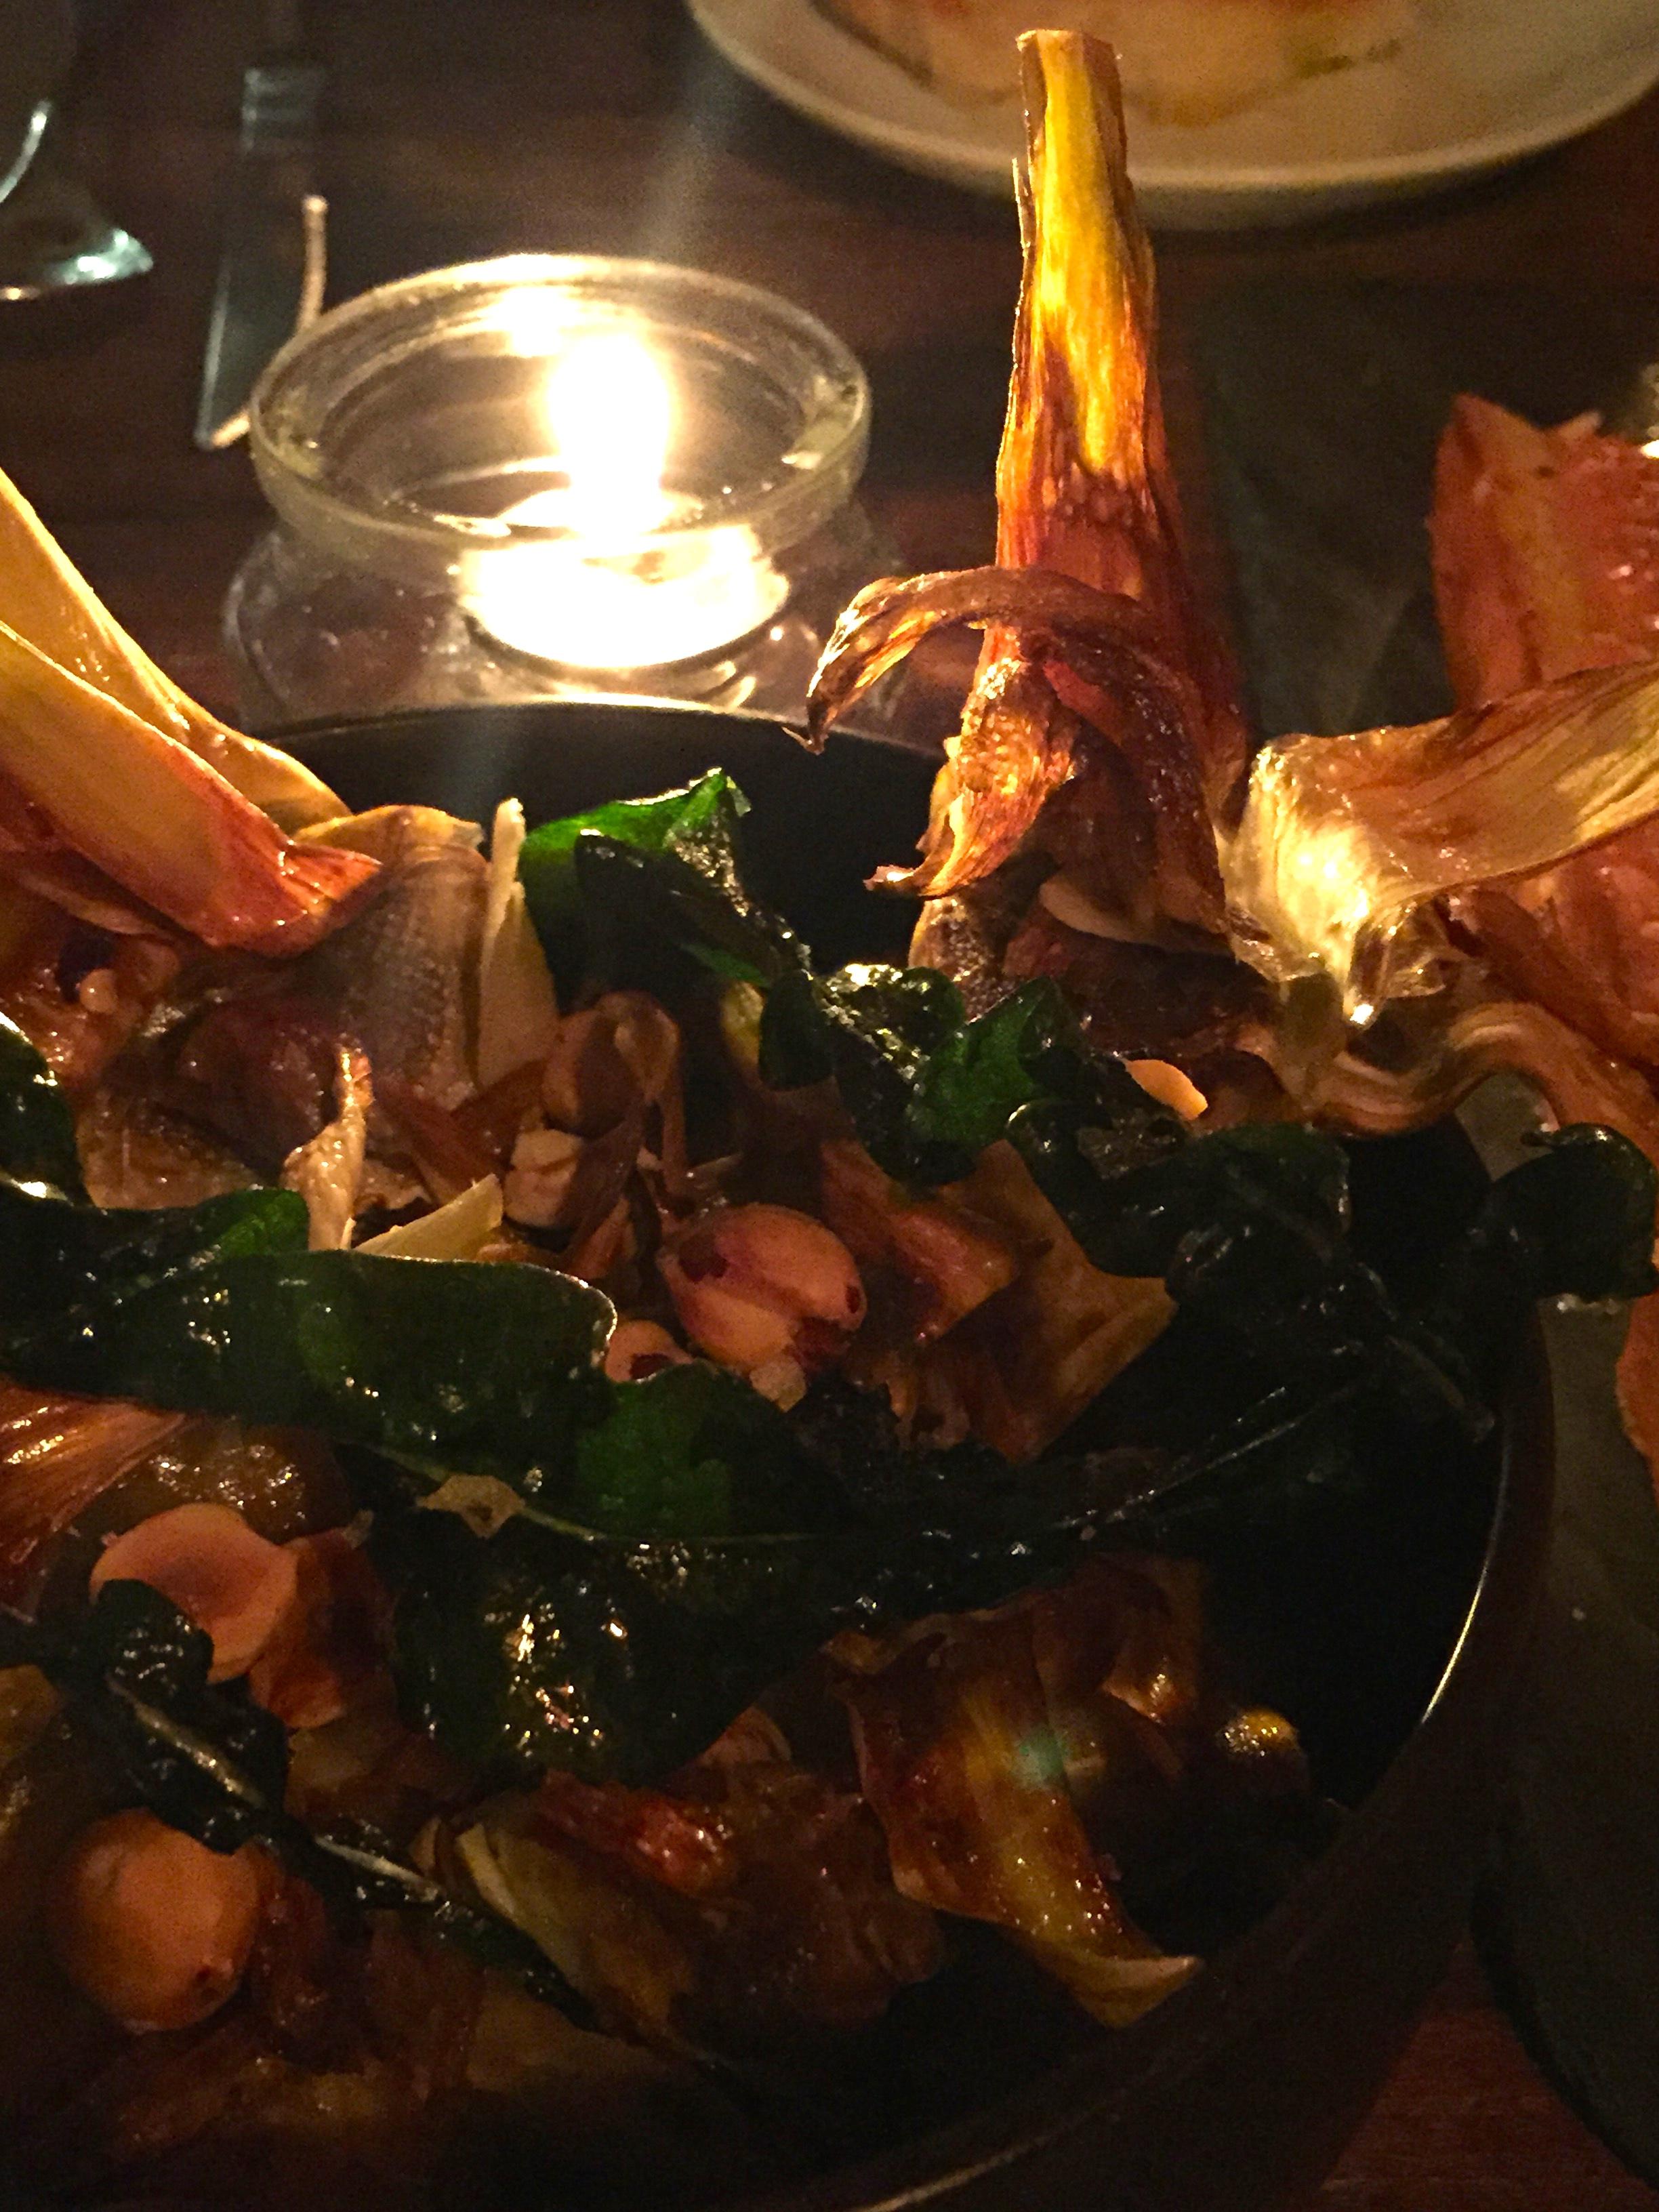 CARXOFES - caramelized globe artichokes and collard kohlrabi, hazelnuts, garlic, and spicy chili